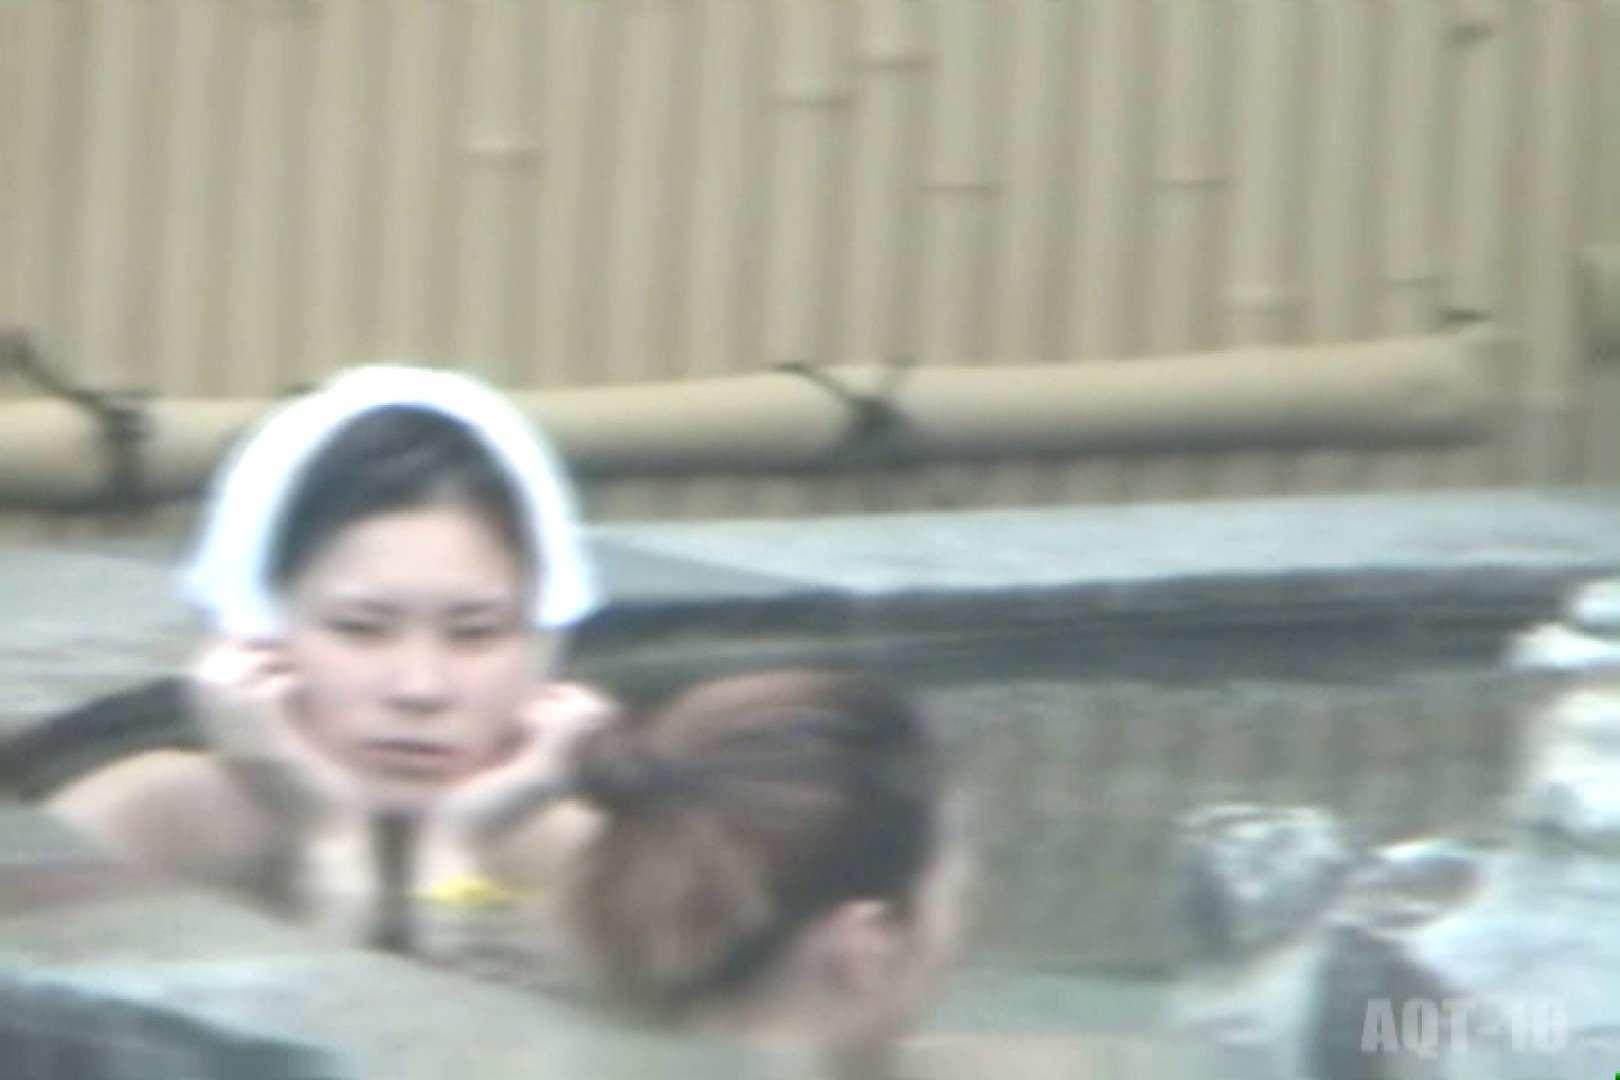 Aquaな露天風呂Vol.792 OLのエロ生活 SEX無修正画像 33連発 17